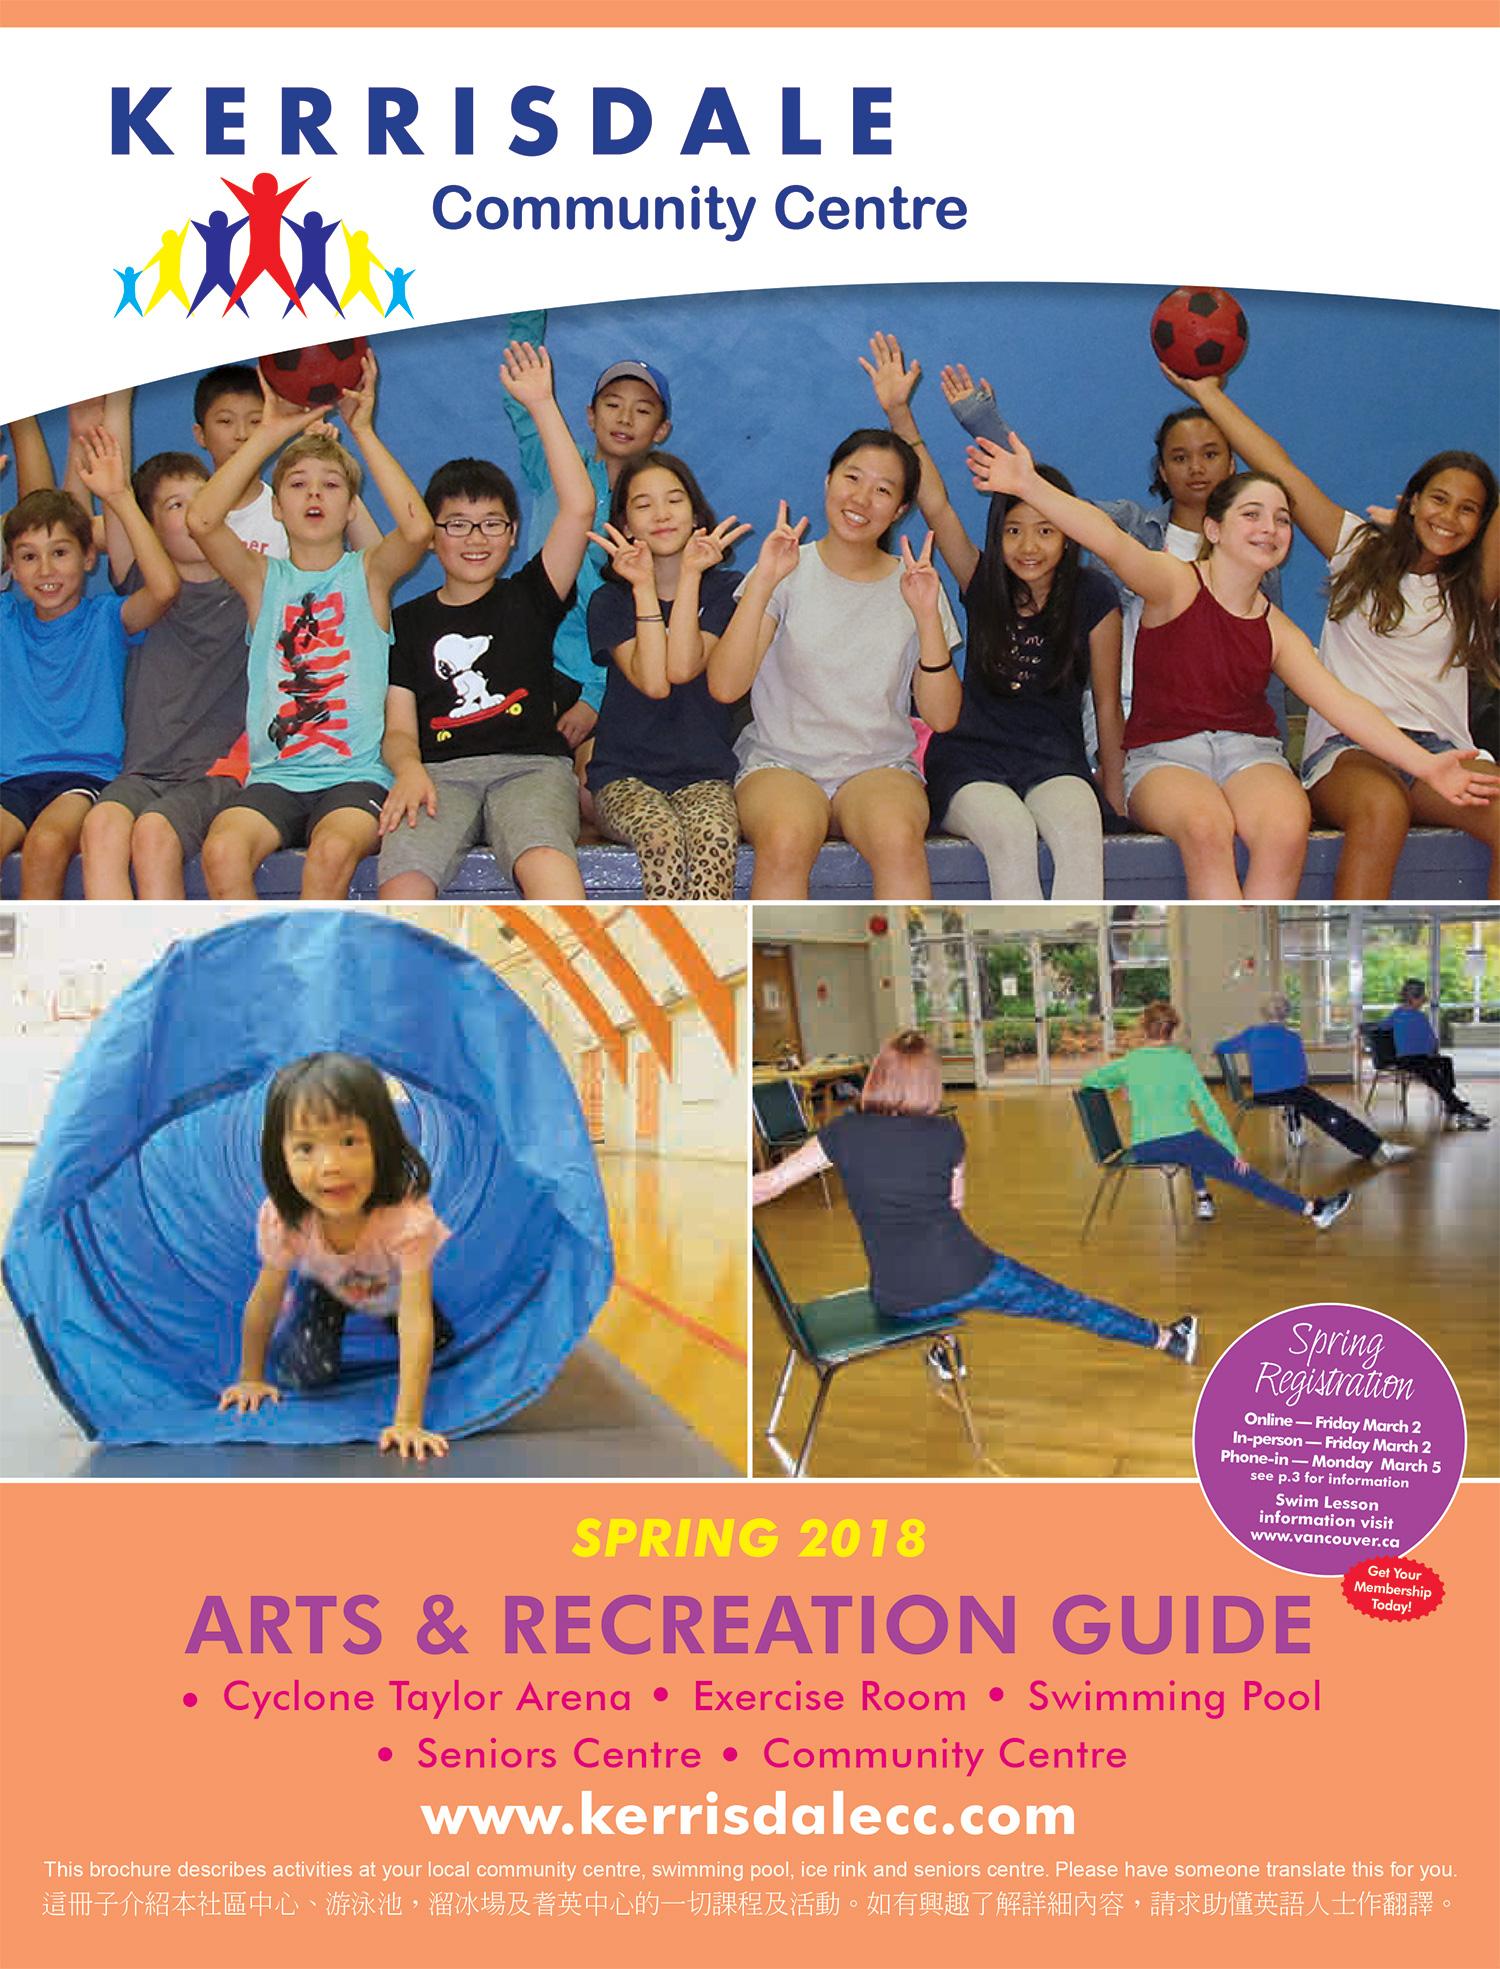 Kerrisdale Community Centre Spring 2018 Recreation Guide 1 Kerrisdale Community Centre